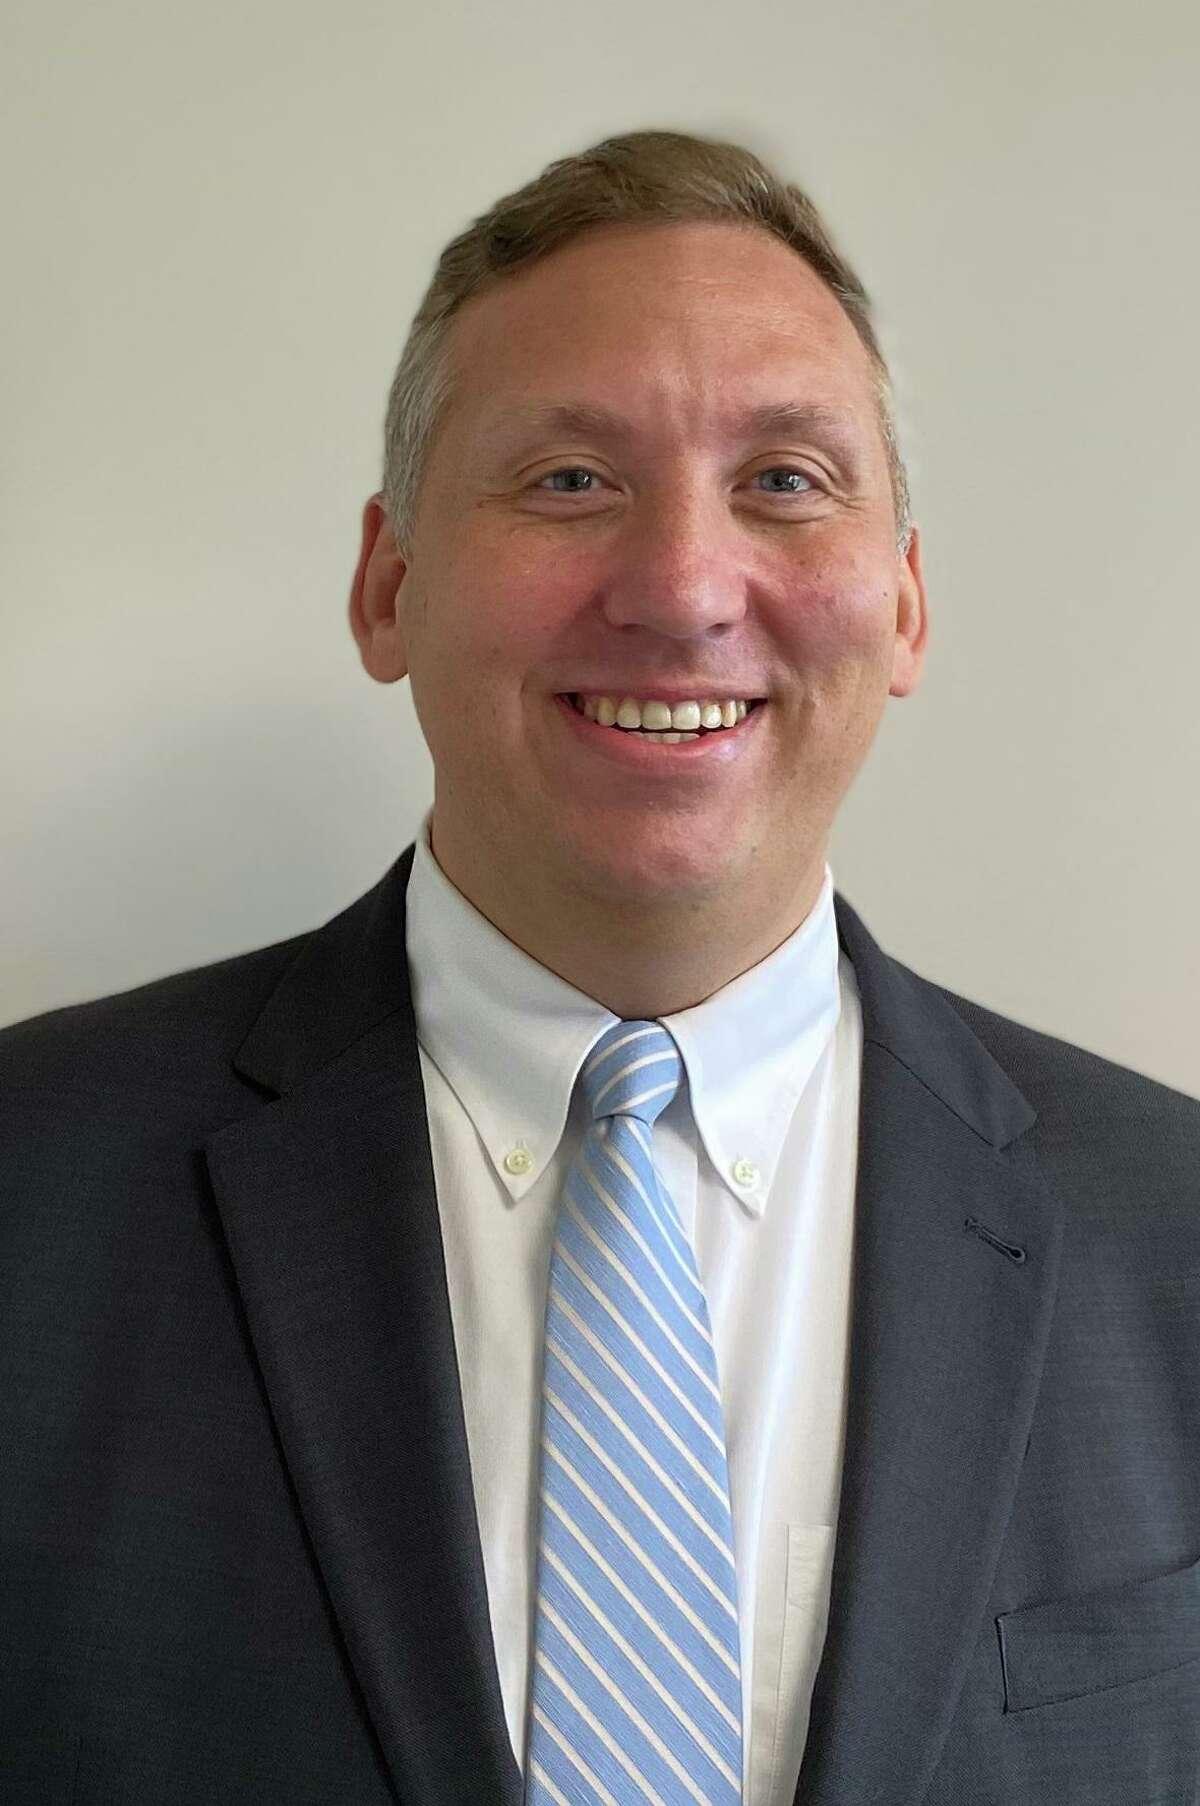 Patrick R. Linsey